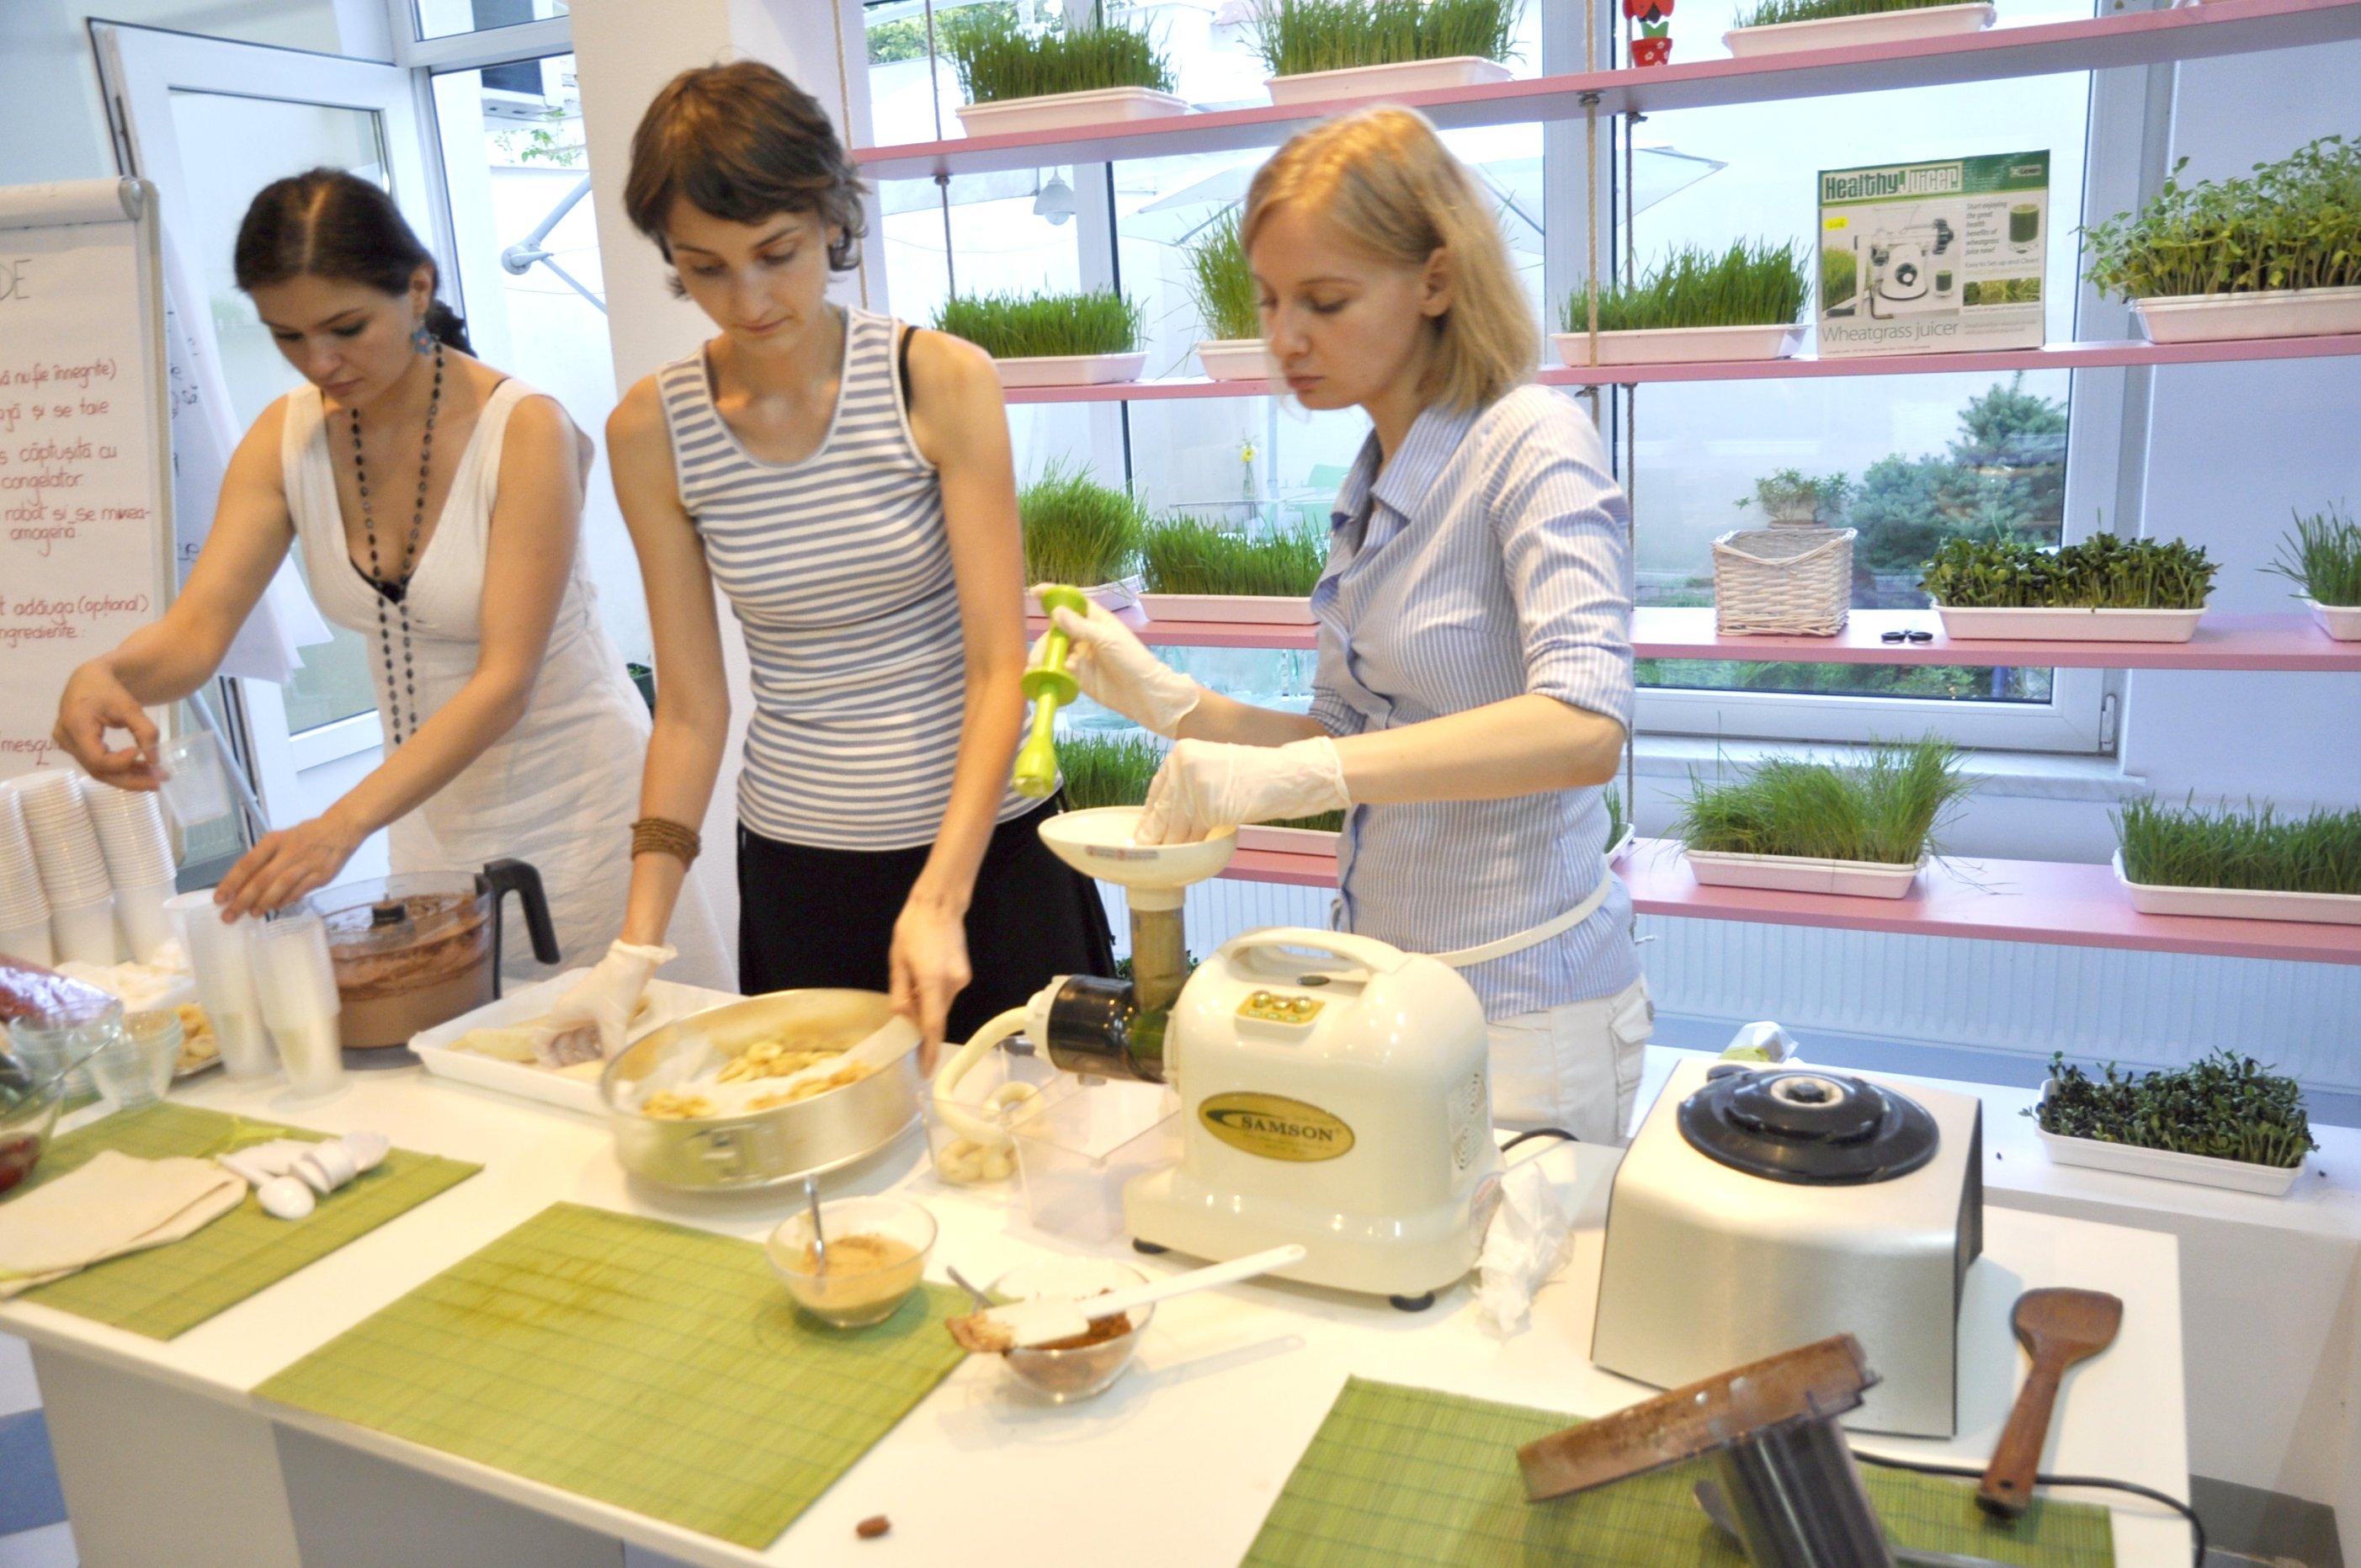 Slow Juicer Banana : Making raw banana ice cream, using Samson slow juicer Flickr - Photo Sharing!